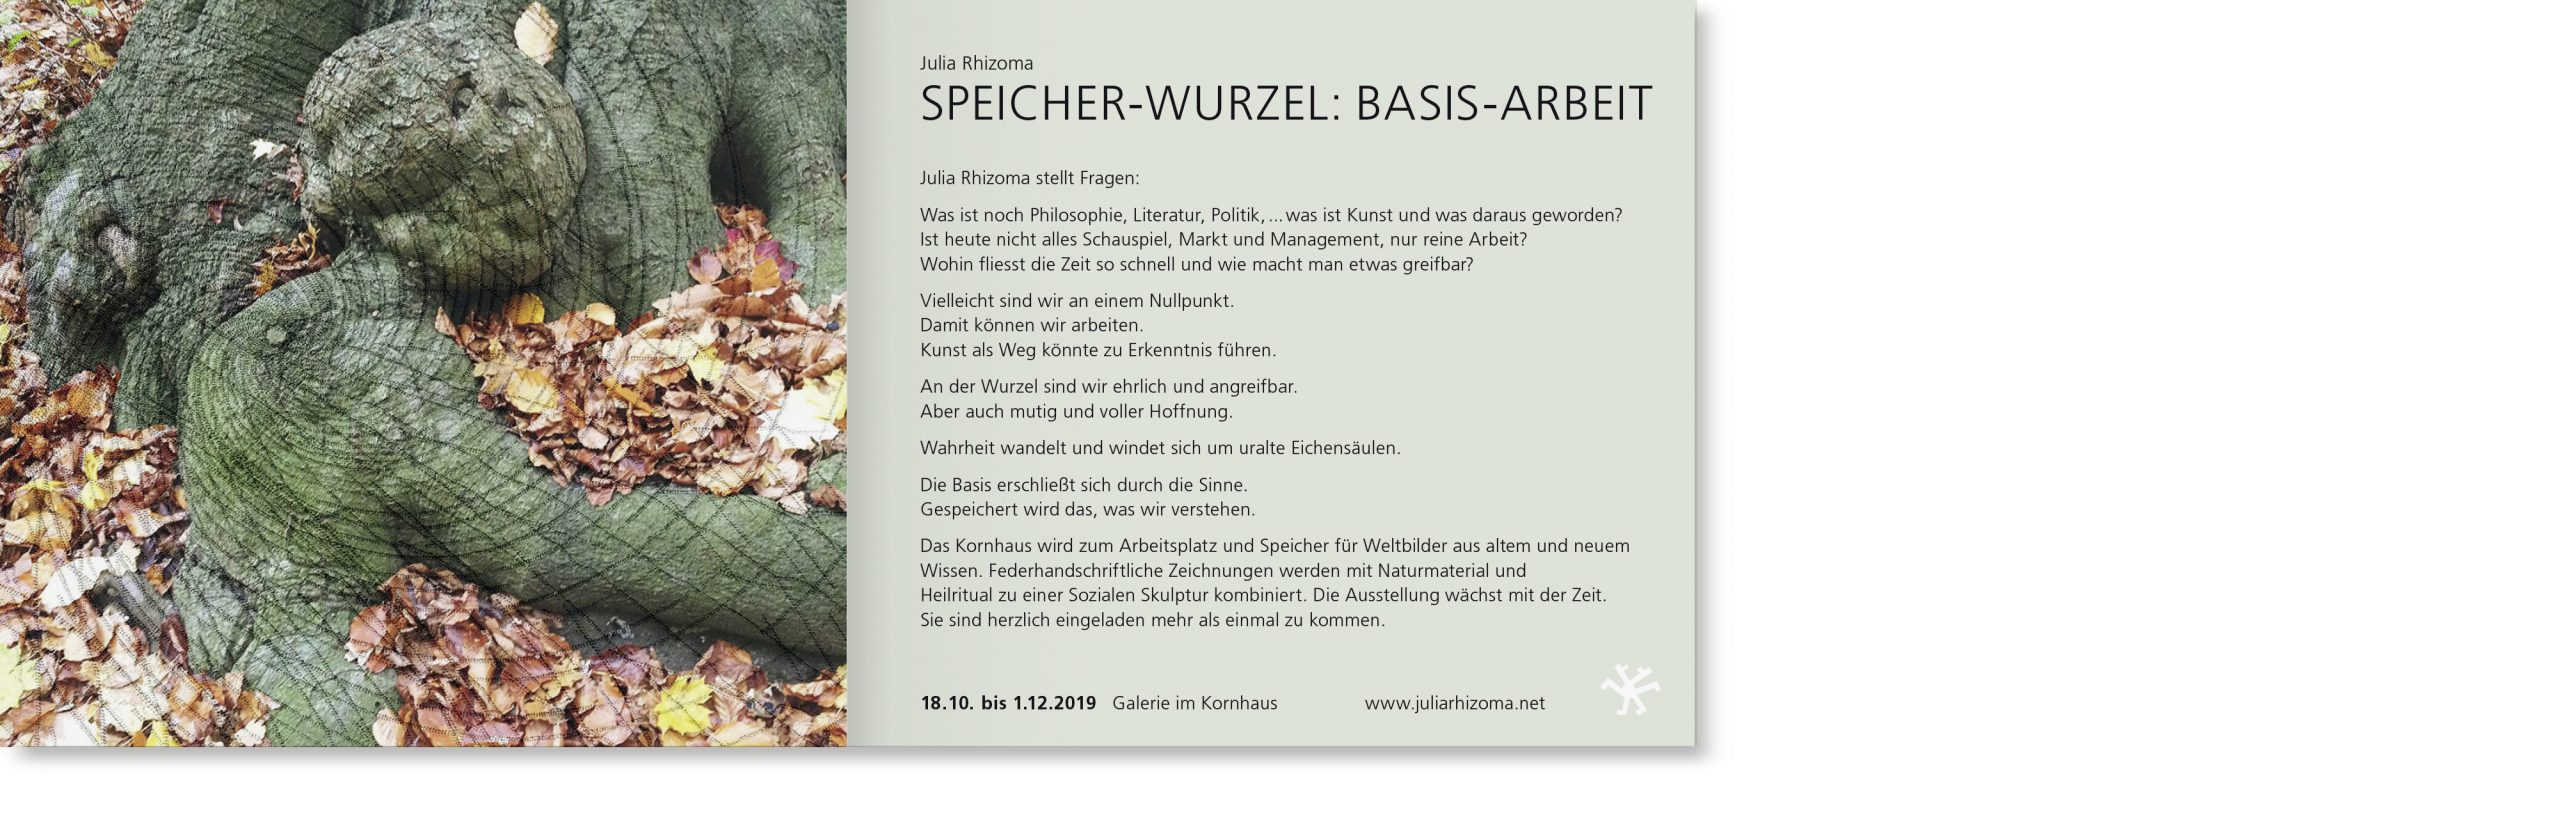 fh-web-kunstverein-programmheft-2019-1-1-scaled.jpg